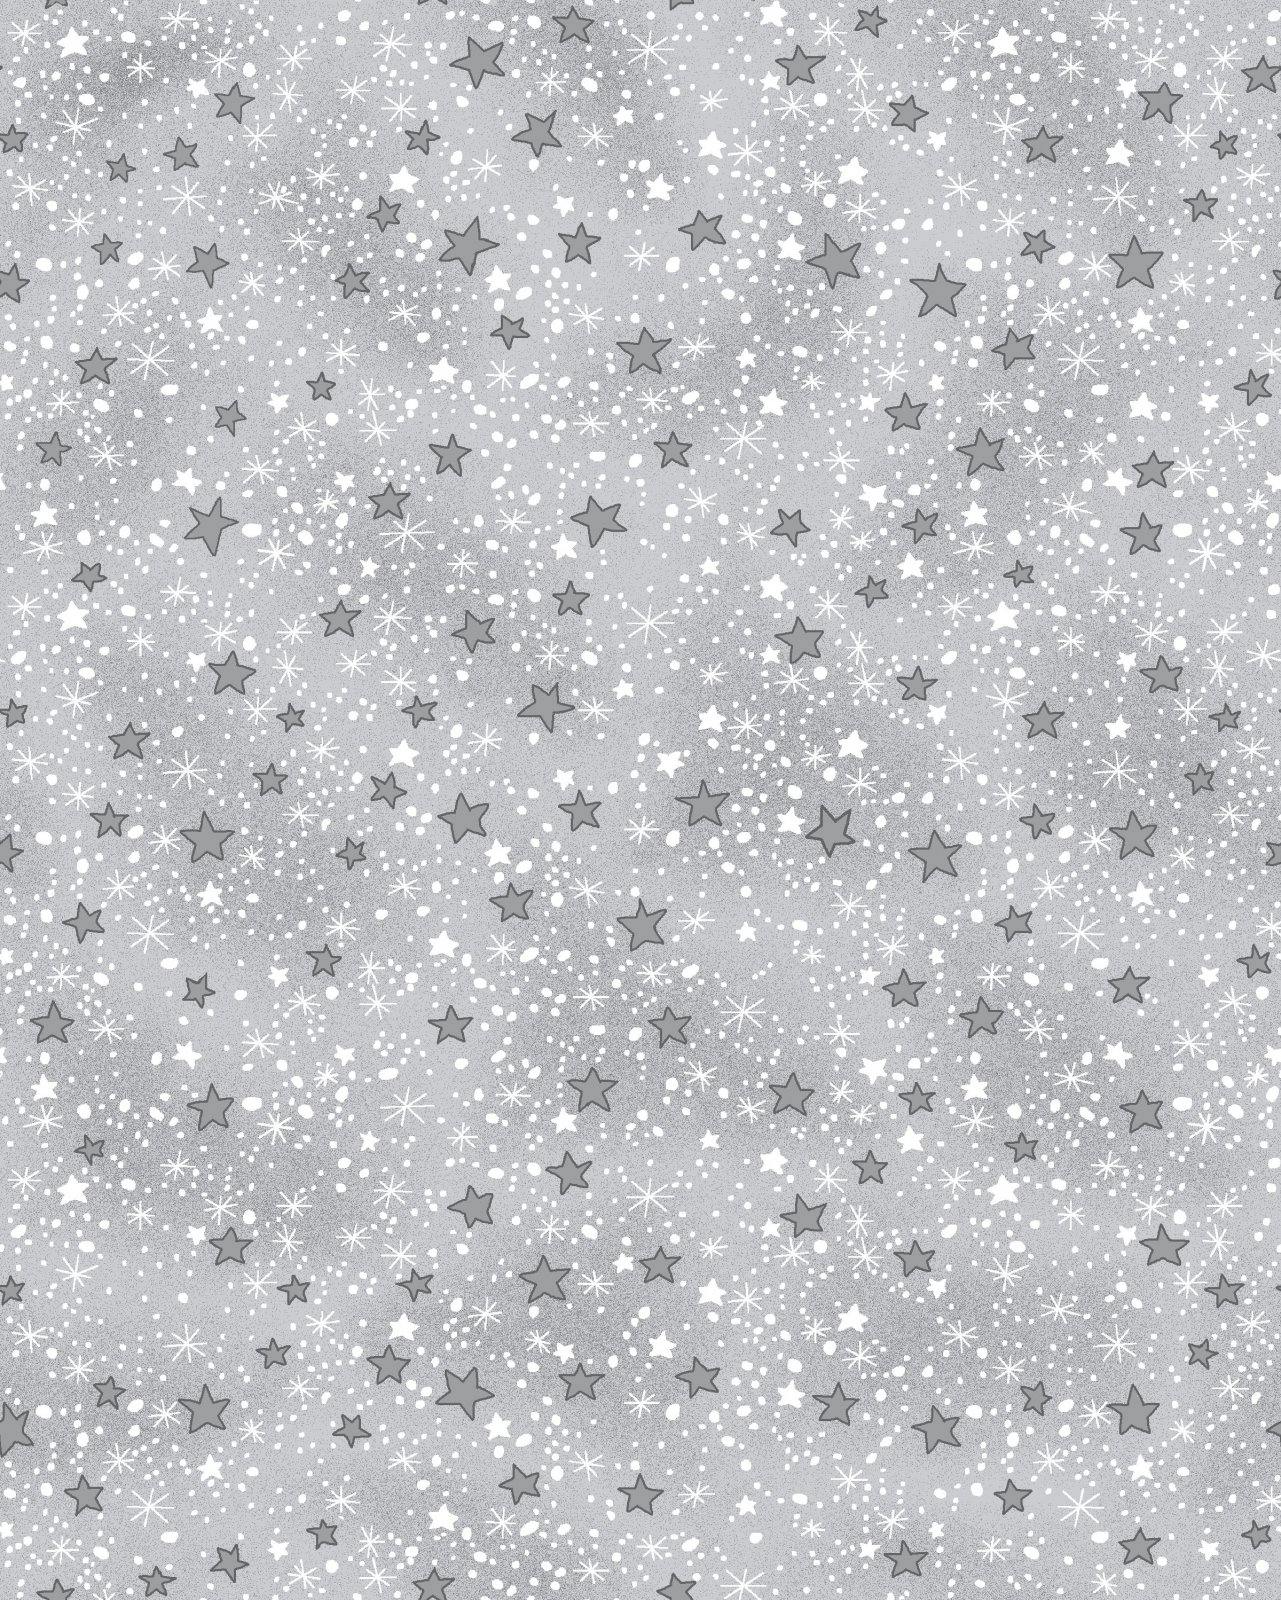 AE-Comfy Flannel Print 9831-99 Grey Mini Stars